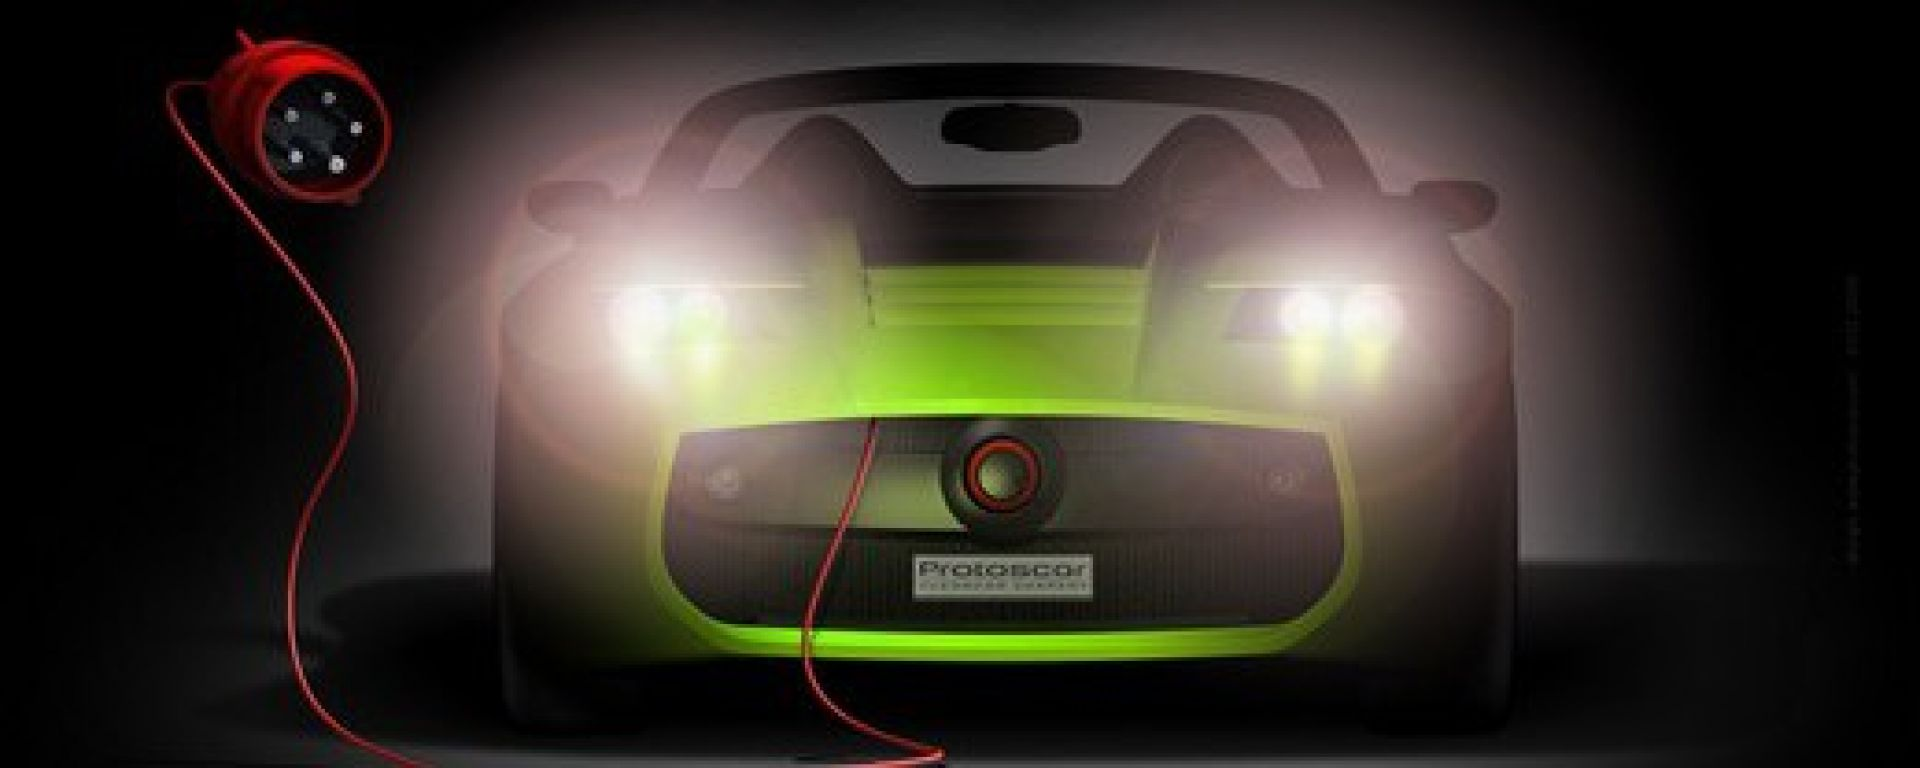 Protoscar Lampo2 EV